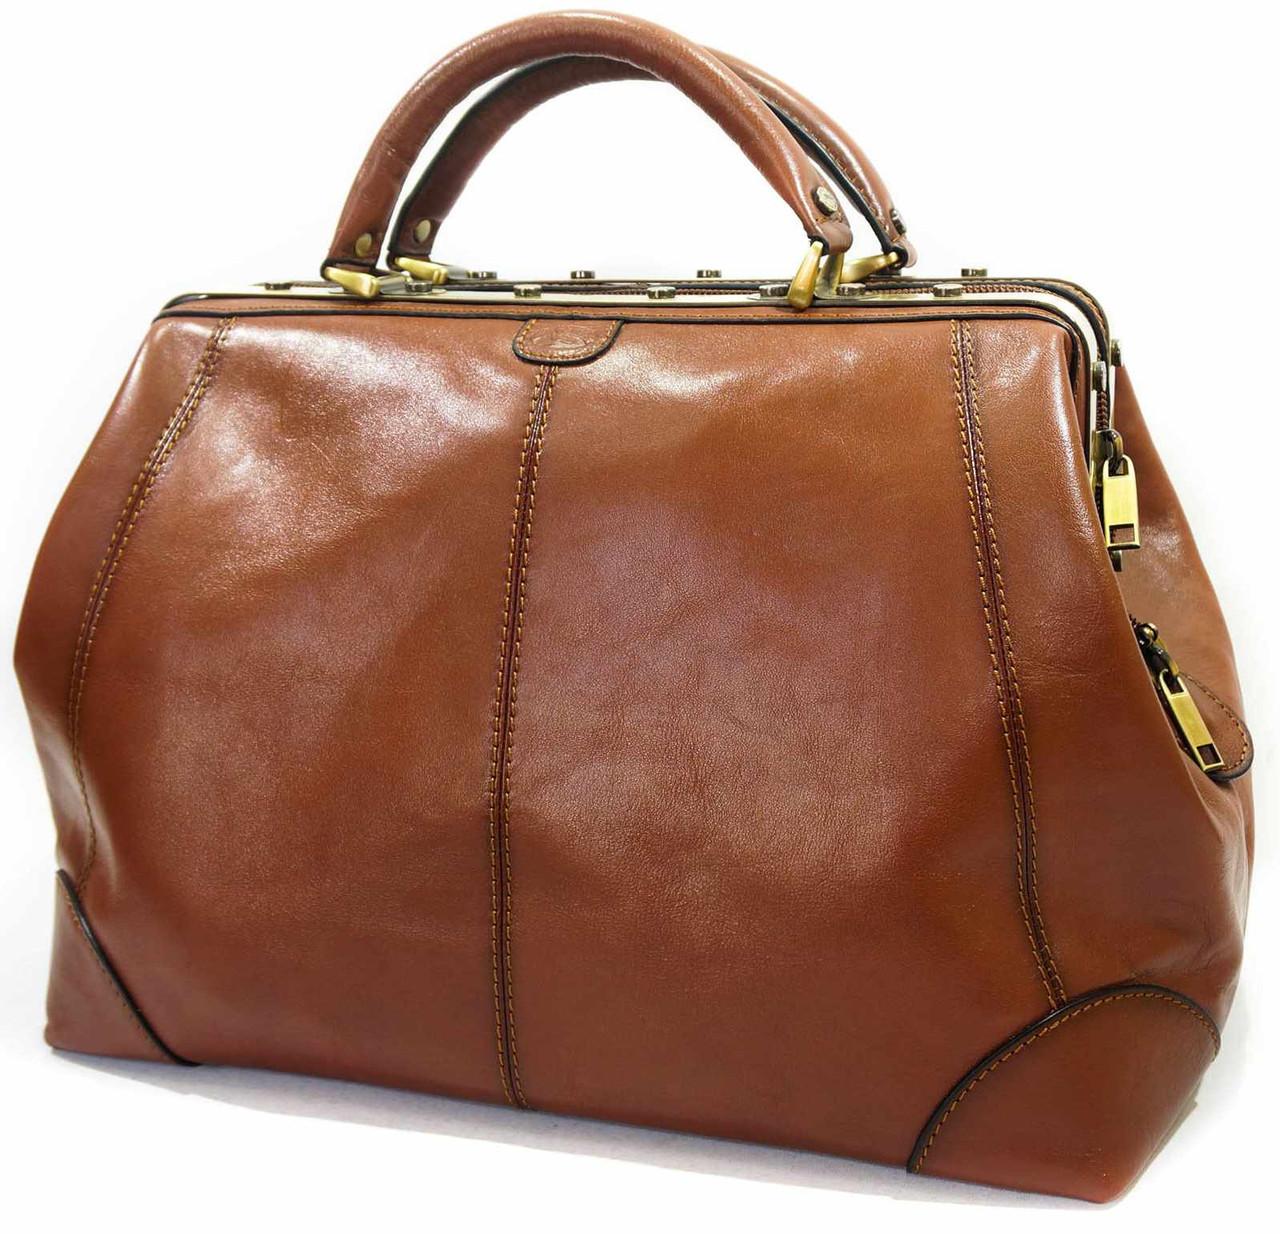 b177b091177b Женский саквояж Katana 1152 коричневый, цена 4 679 грн., купить в ...